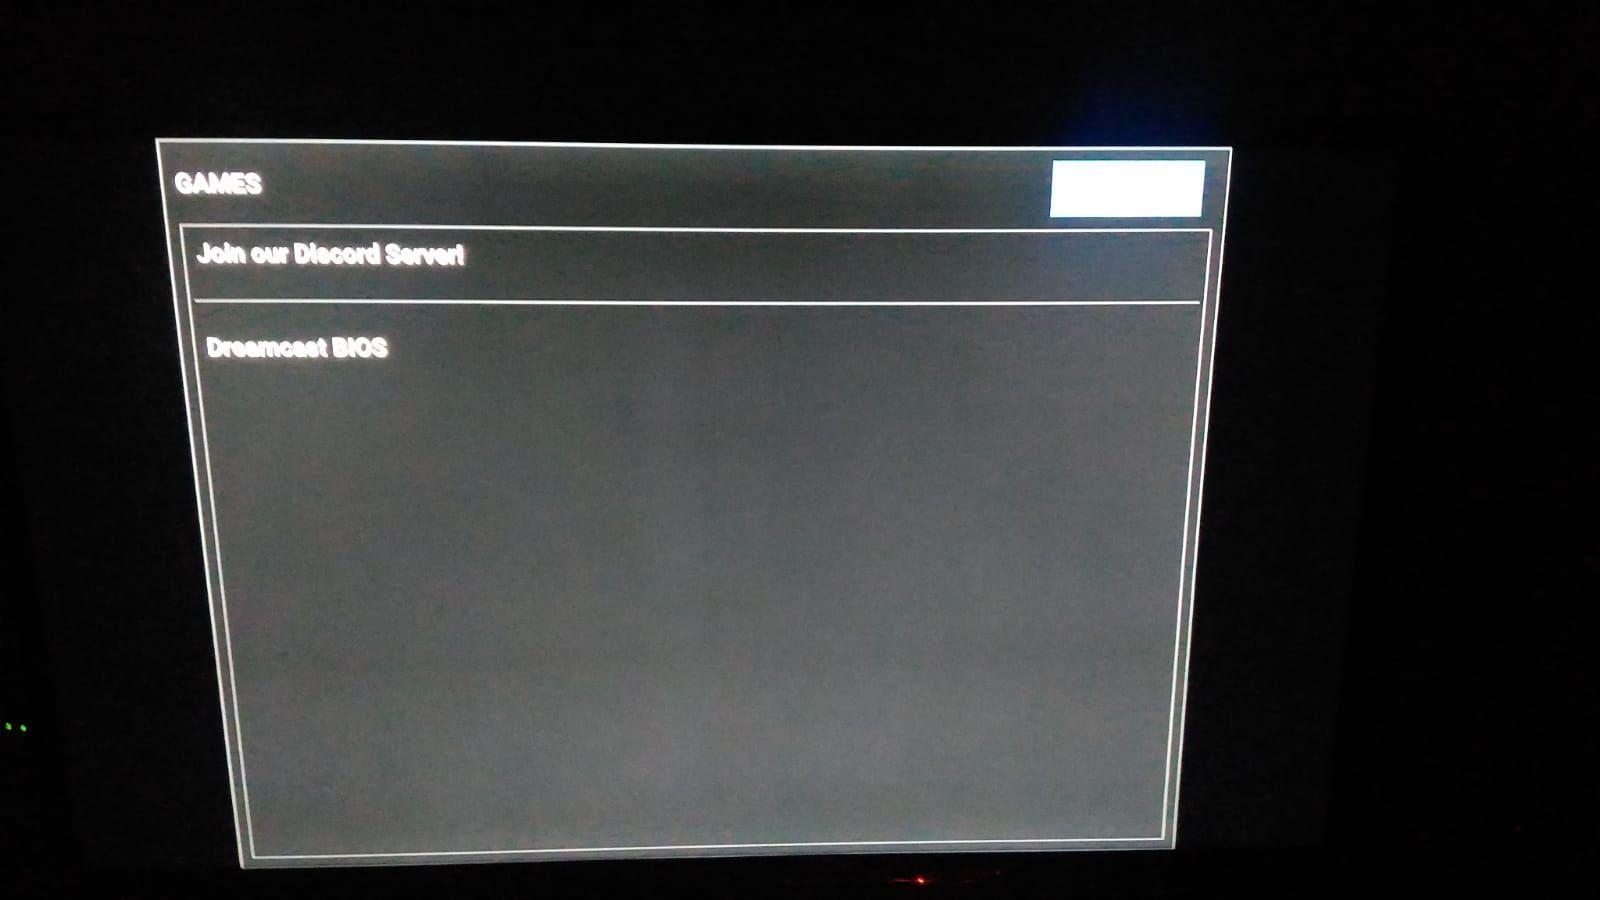 Dreamcast reicast not starting - RetroPie Forum